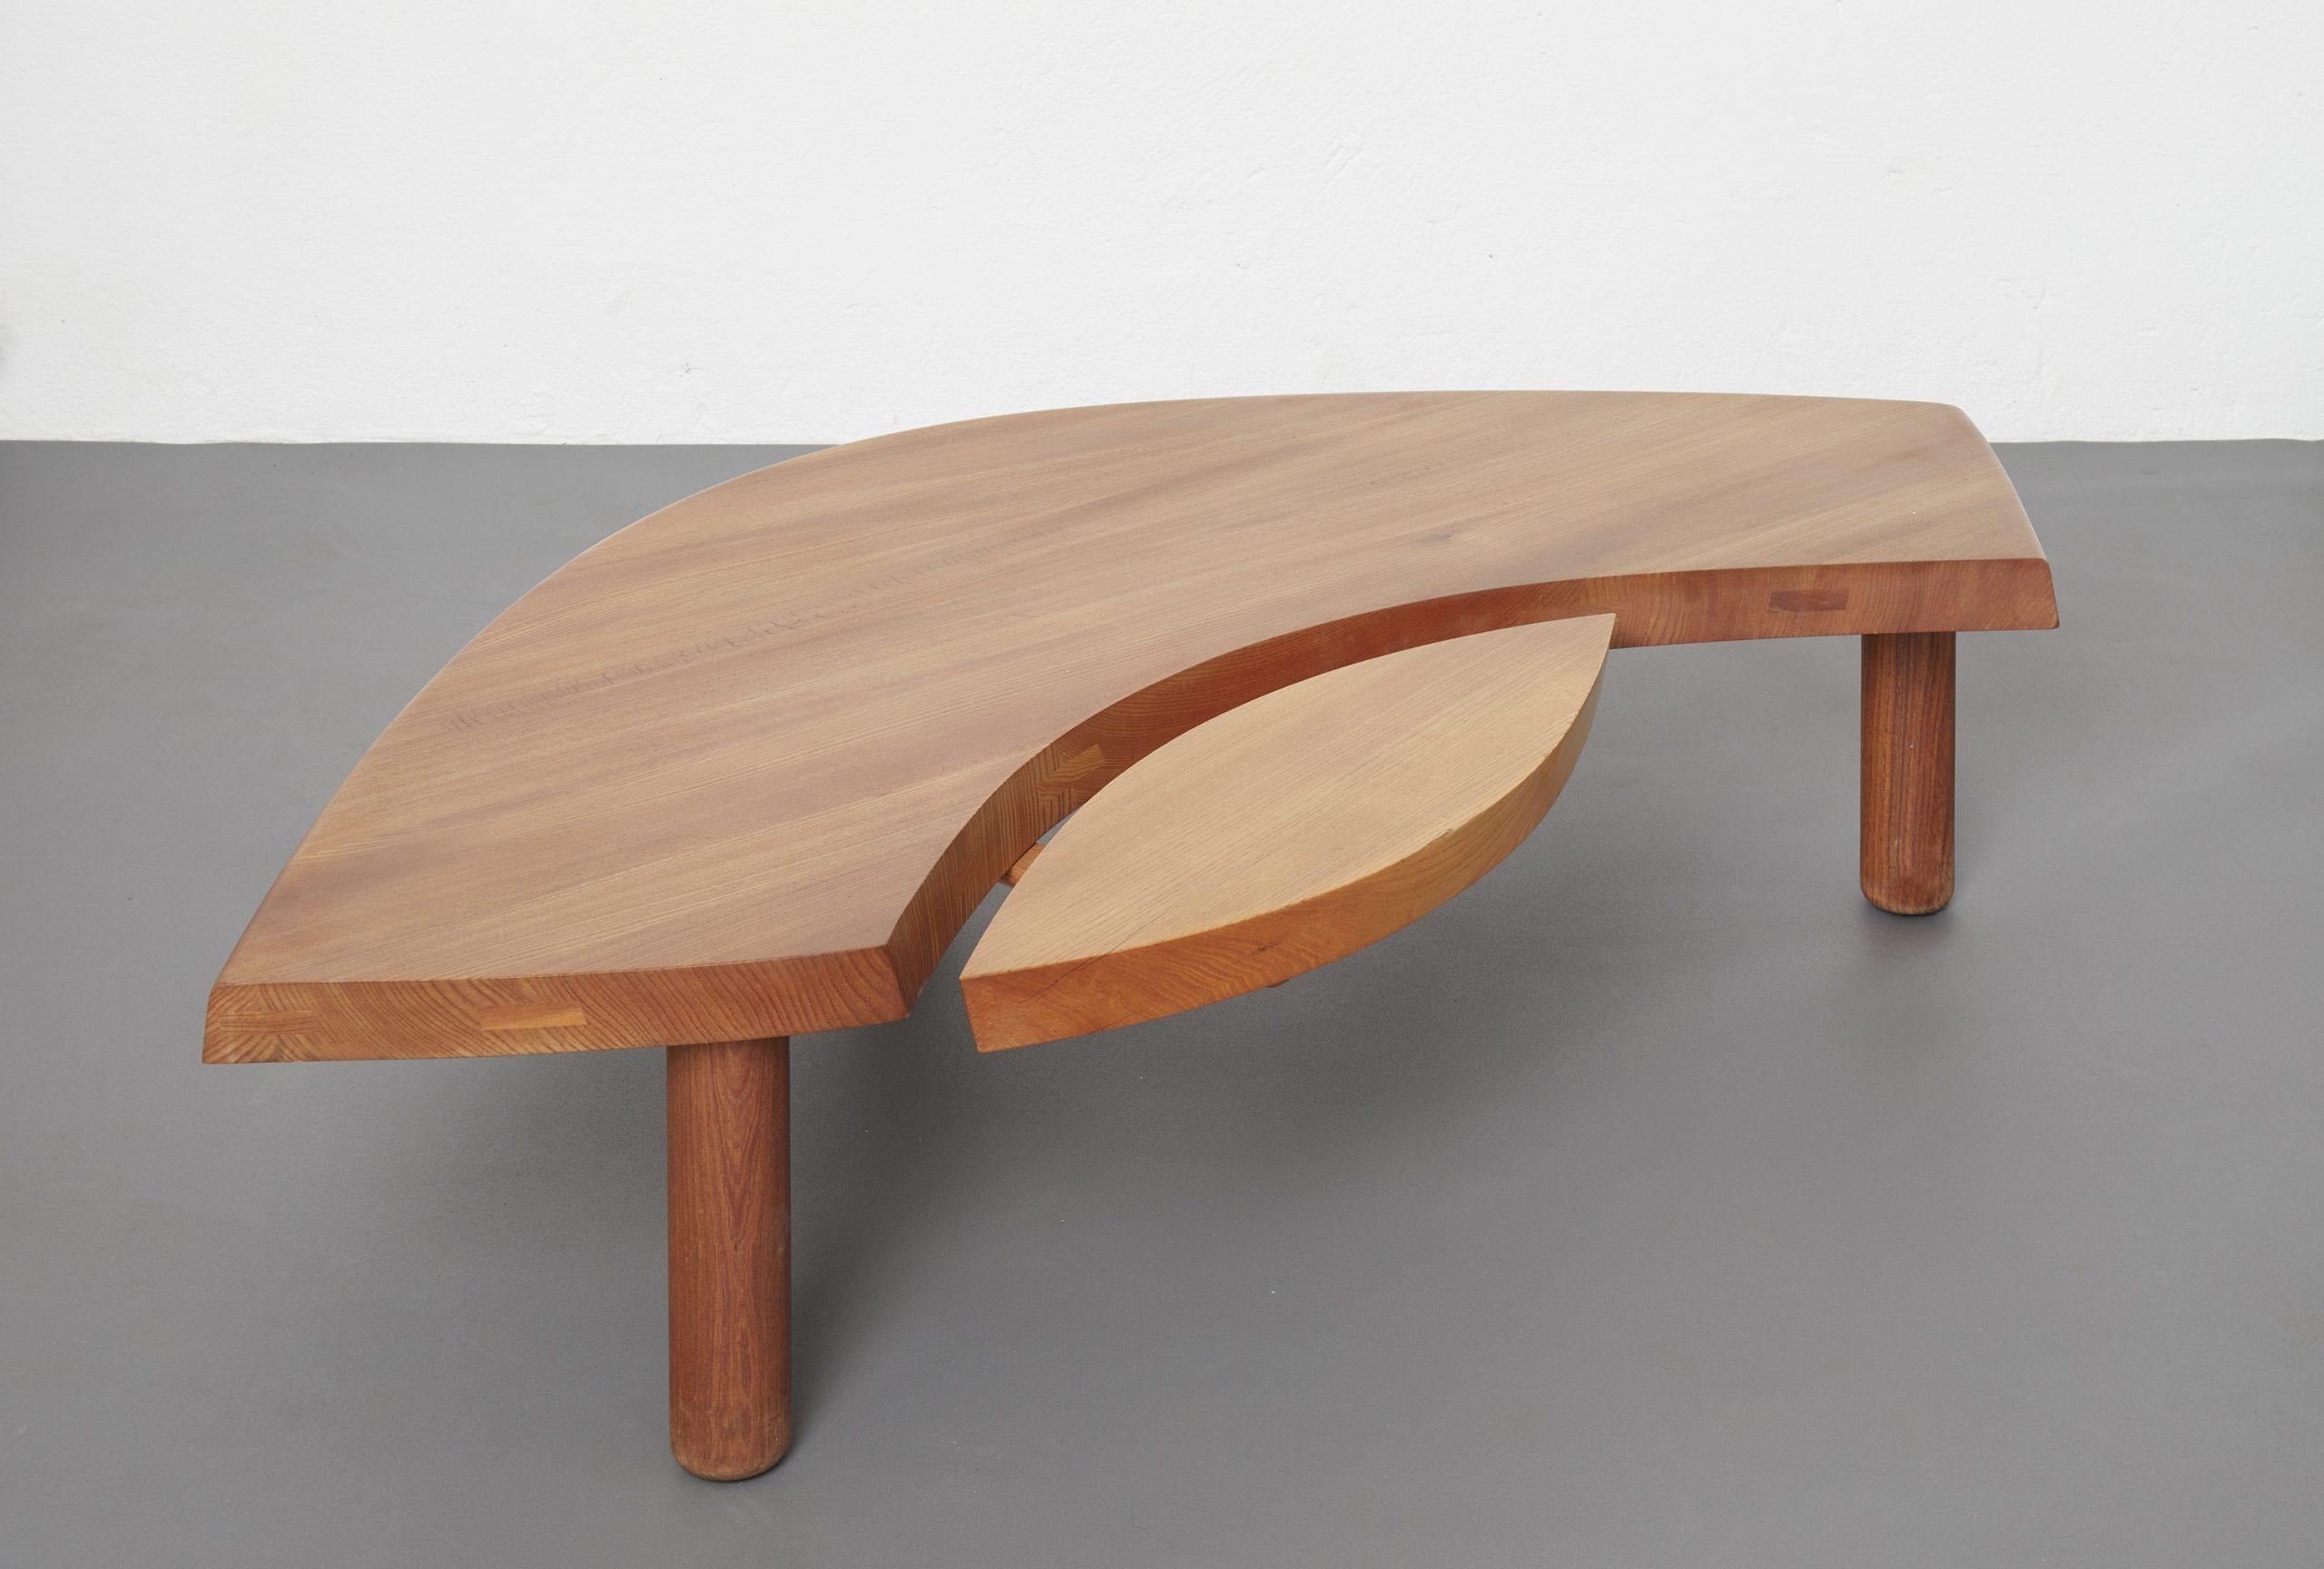 single-elmwood-low-table-t22-by-pierre-chapo-image-01